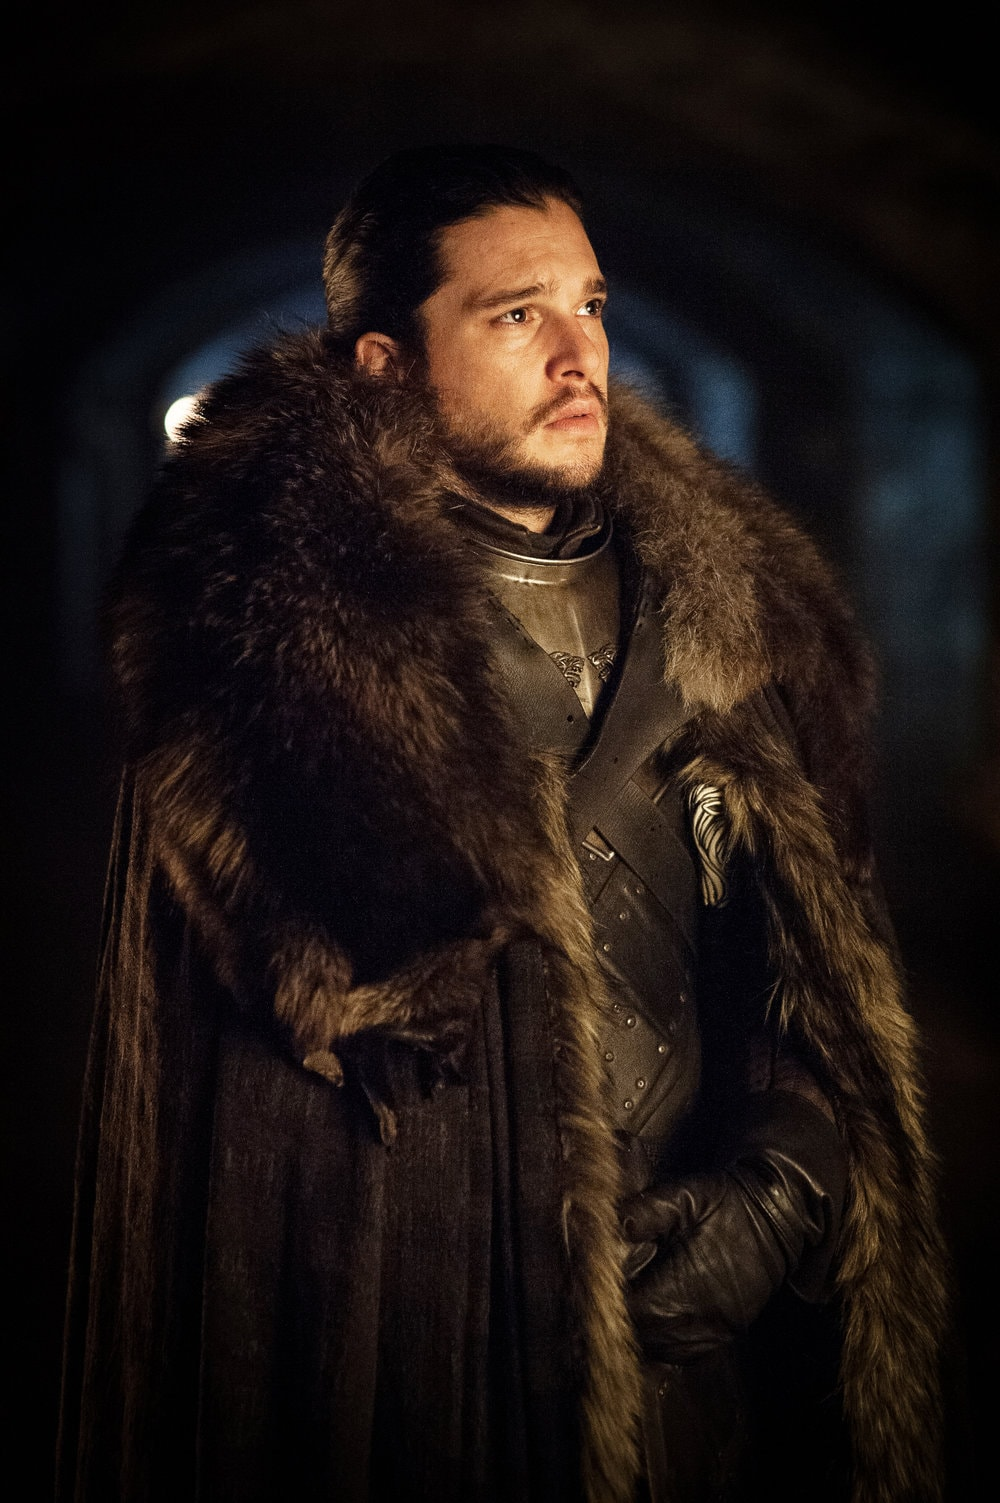 GoT Sn7 FirstLook 09 Game of Thrones Season 7 first look